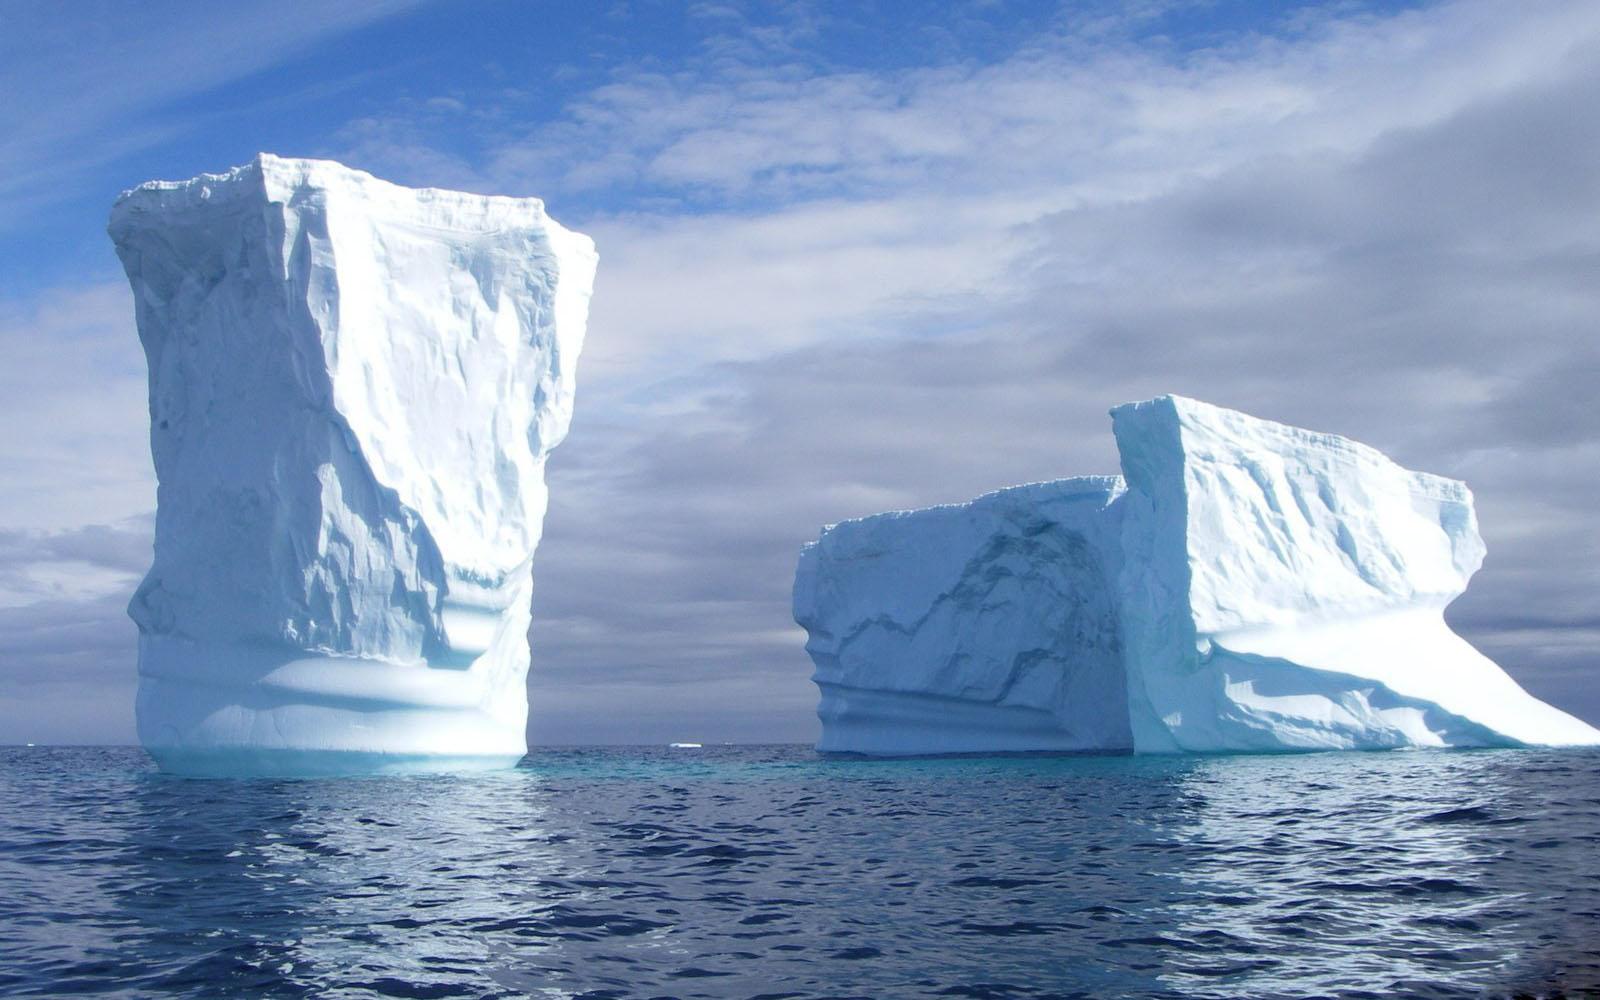 Yamaha Mt 07 besides Hero Honda Hunk moreover Huge Antarctic Iceberg Wallpapers moreover Watch in addition Yamaha Fazer8 Fz 8 Orjinal Egzoz 2015 Model 2e9c2508 Cd97 4134 B579 Ffb9ad167c04. on yamaha fz